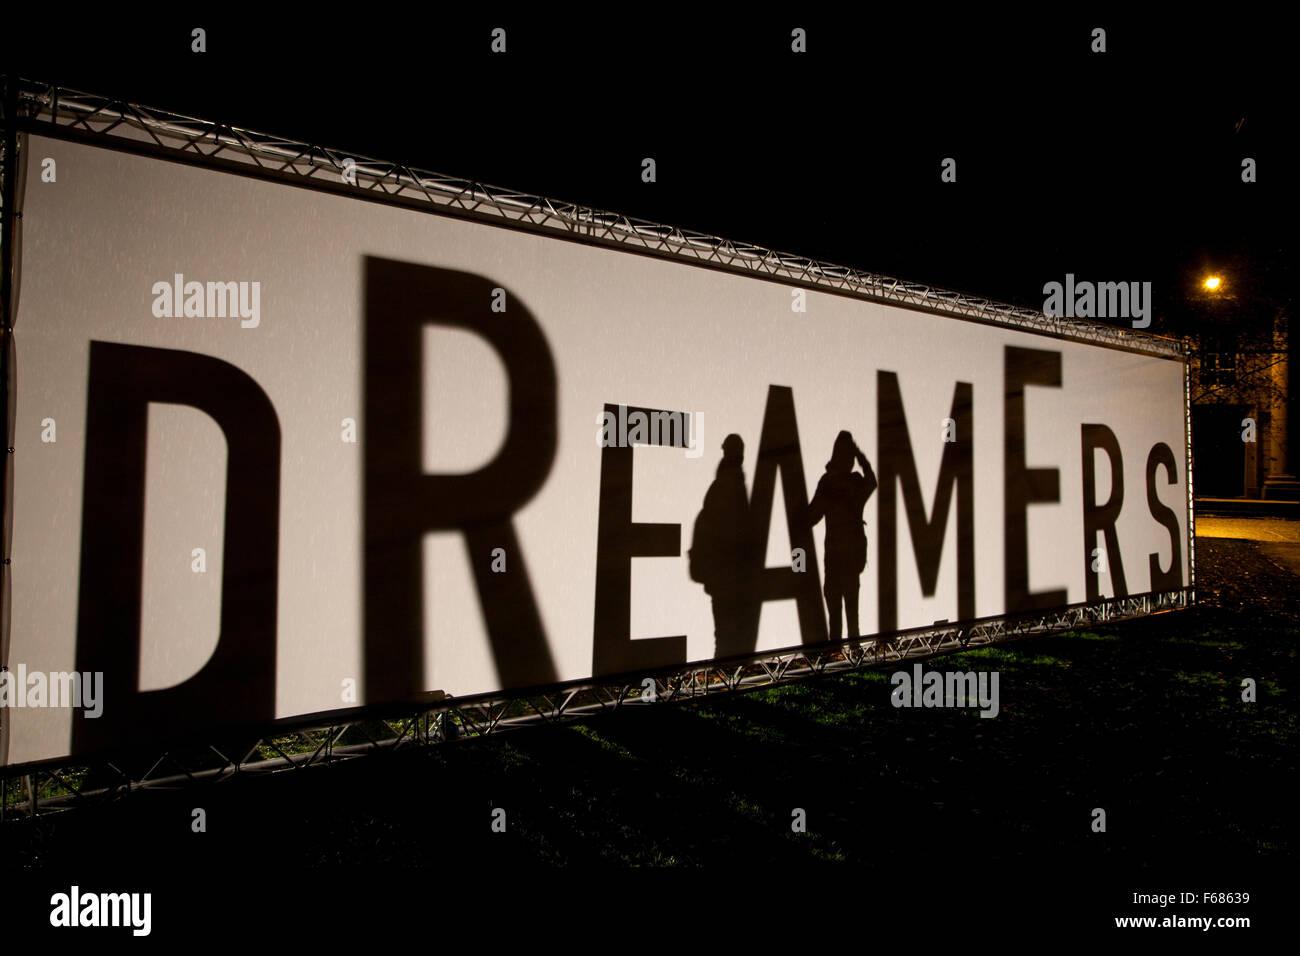 Durham, Co. Durham, England - November 13, 2015:  DREAMERS, by Elisa Artesero (UK), in the Crown Court Gardens. - Stock Image